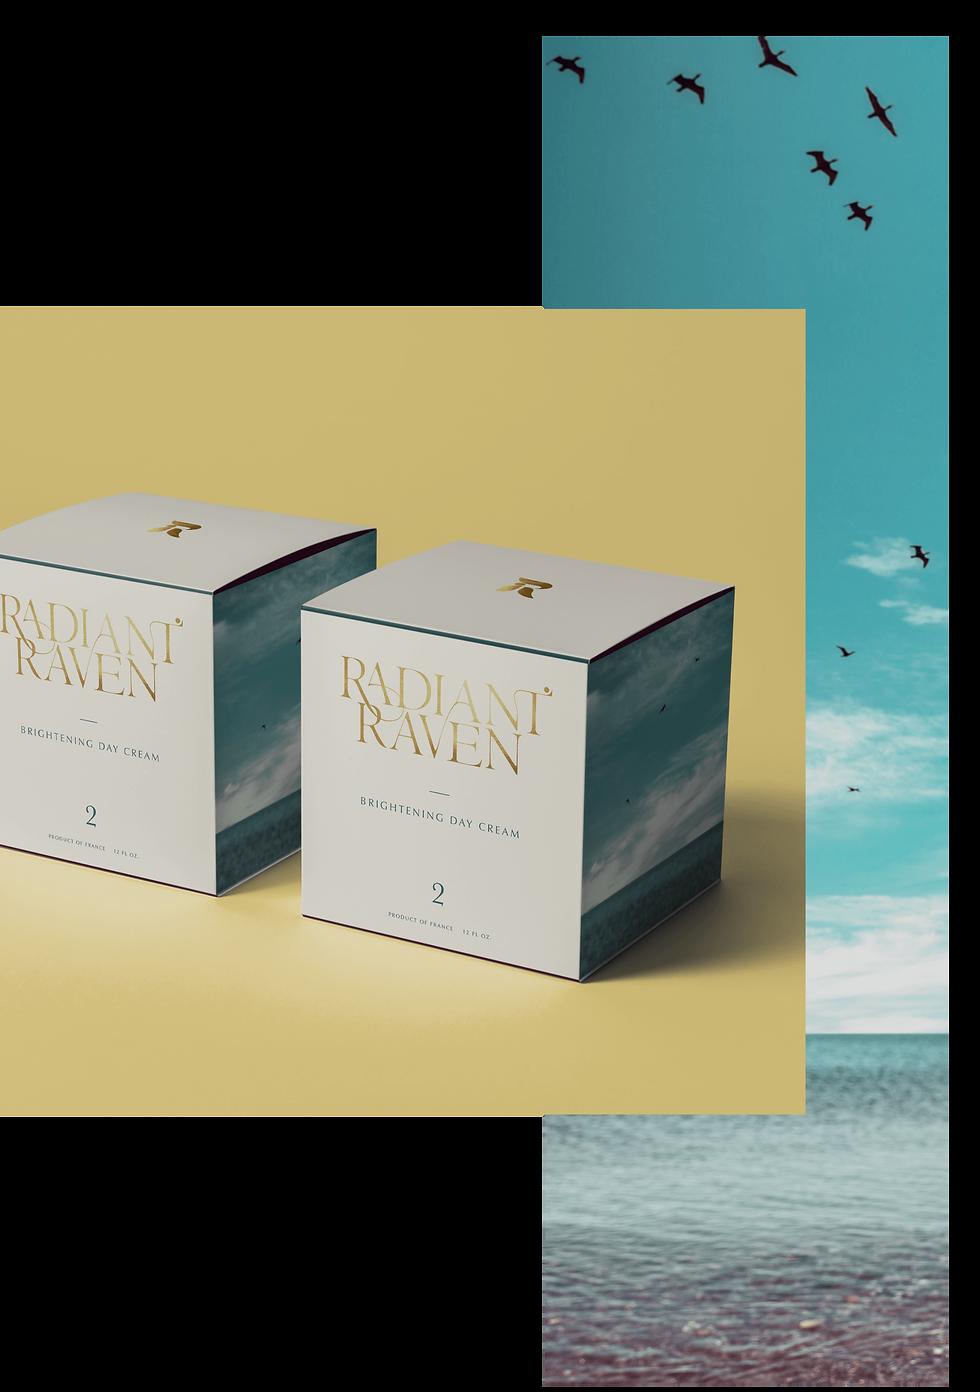 Radiant Raven Branding and Packaging Design